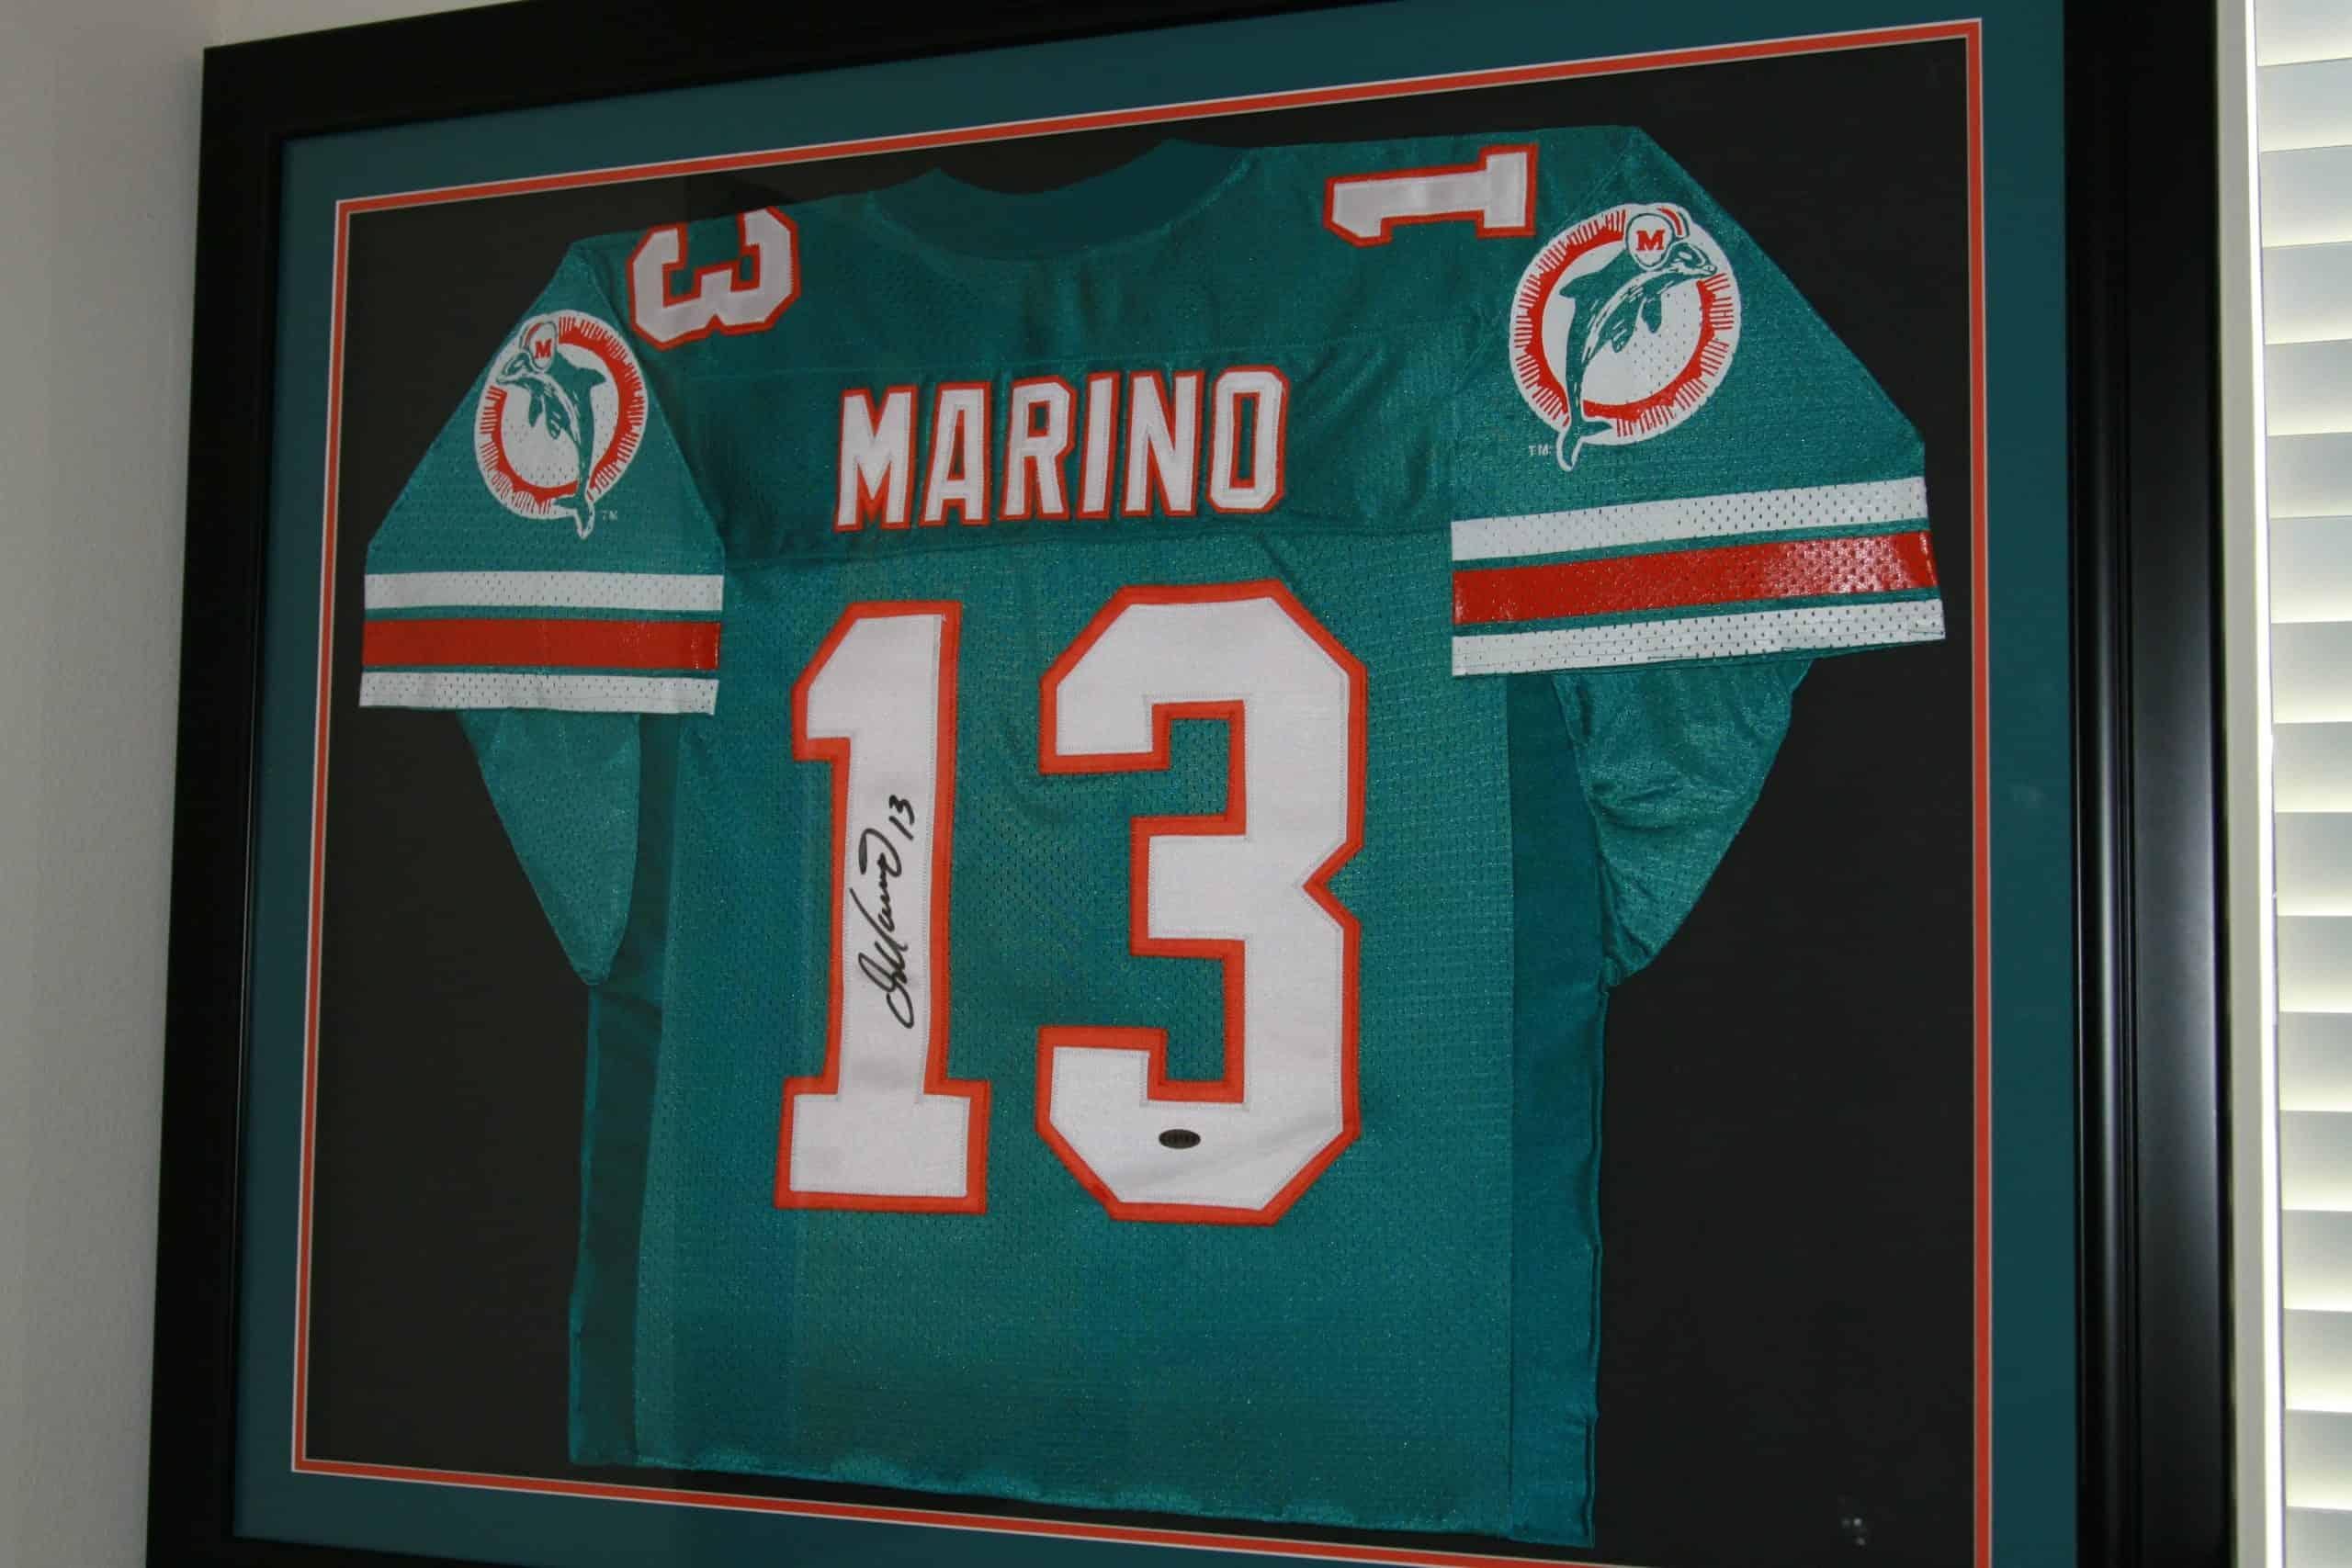 5a075ffc8 DAN MARINO Autographed NFL Jersey PRO BOWL SEASON